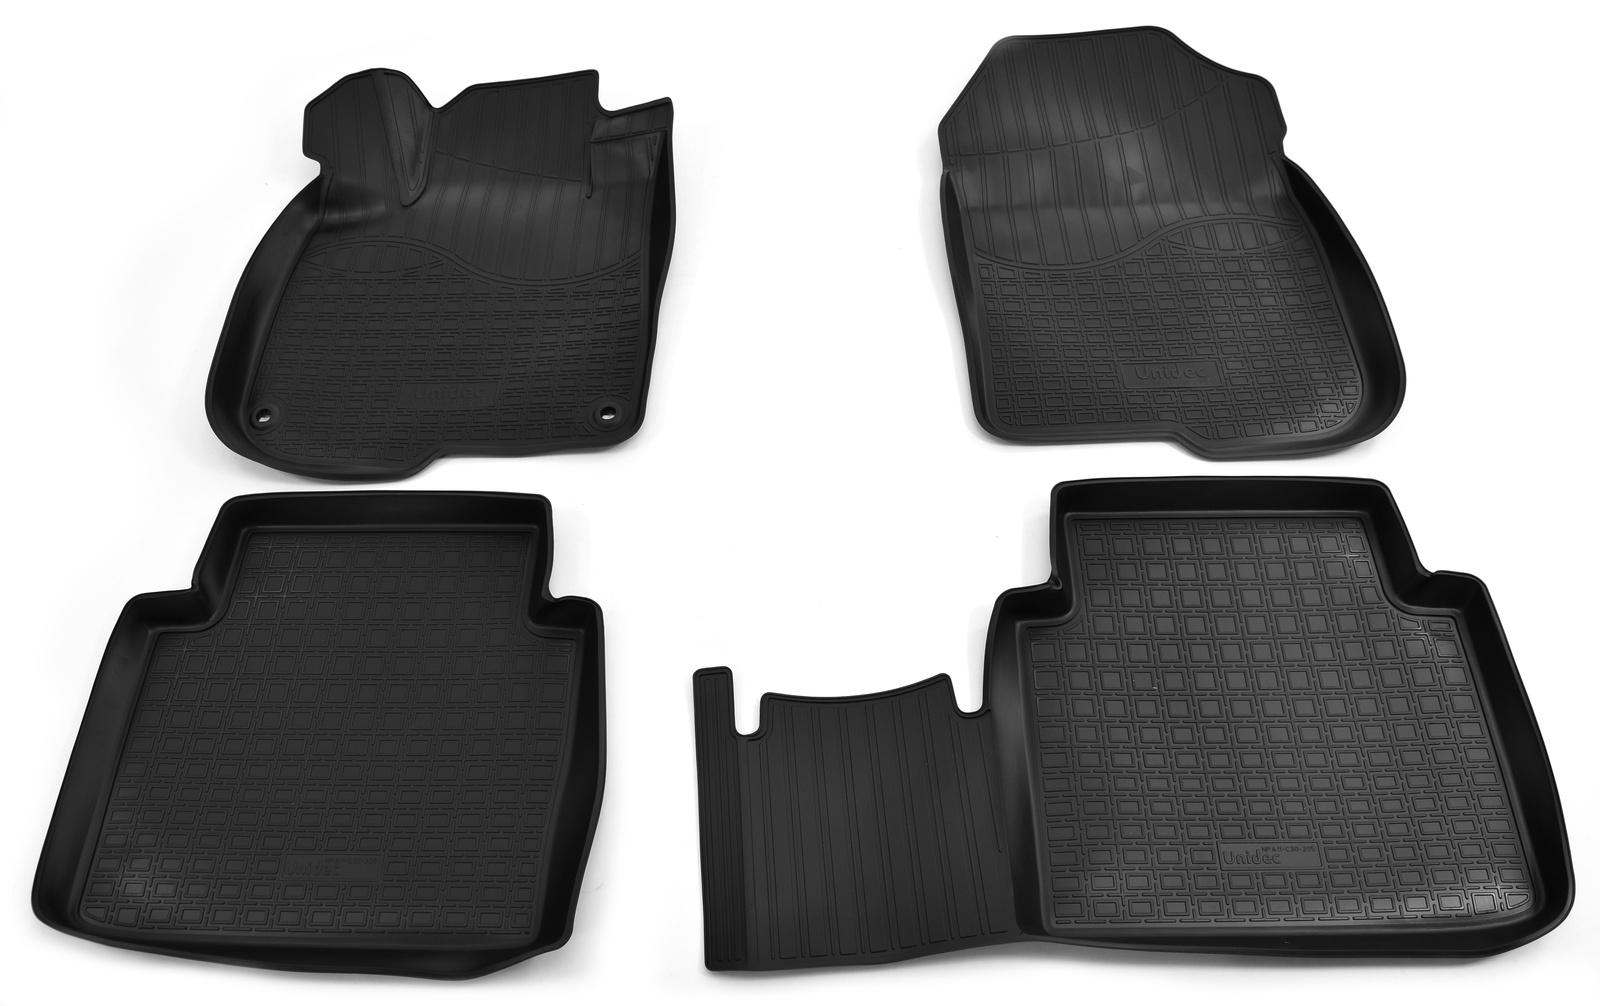 Коврики в салон Norplast для Honda CR-V V 3D 2017, NPA11-C30-205, черный цена